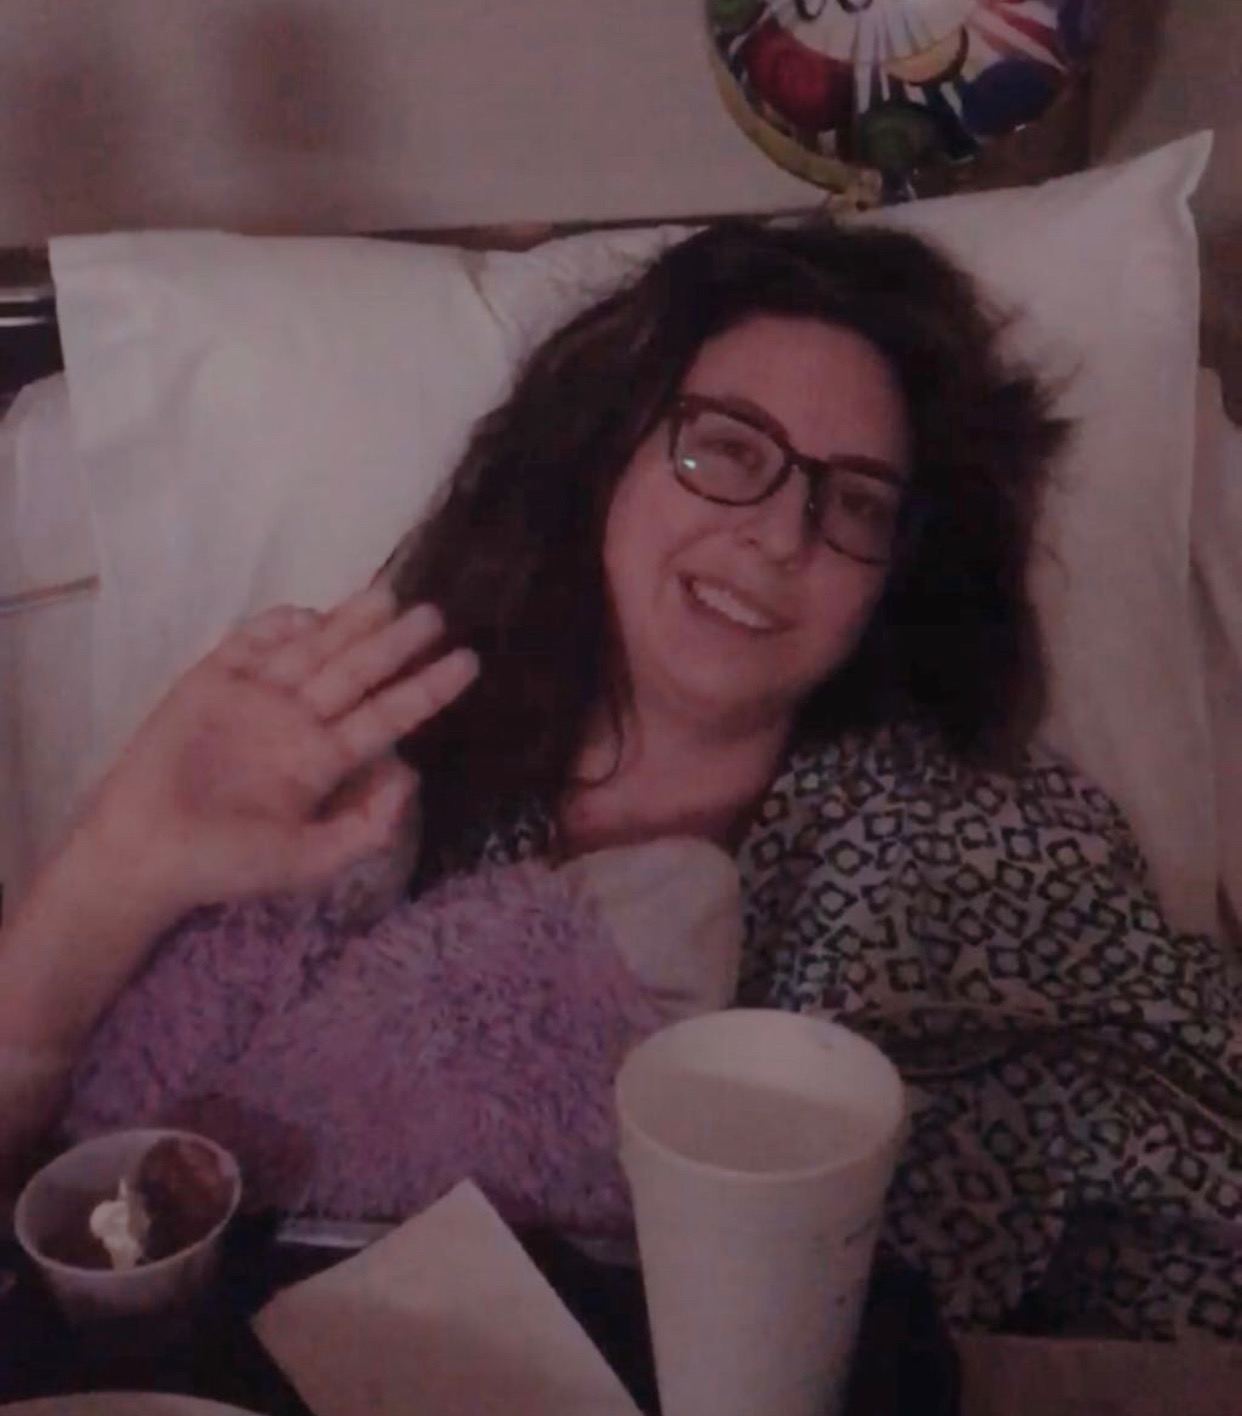 Young Stroke Survivor after surgery. Stroke deficits.